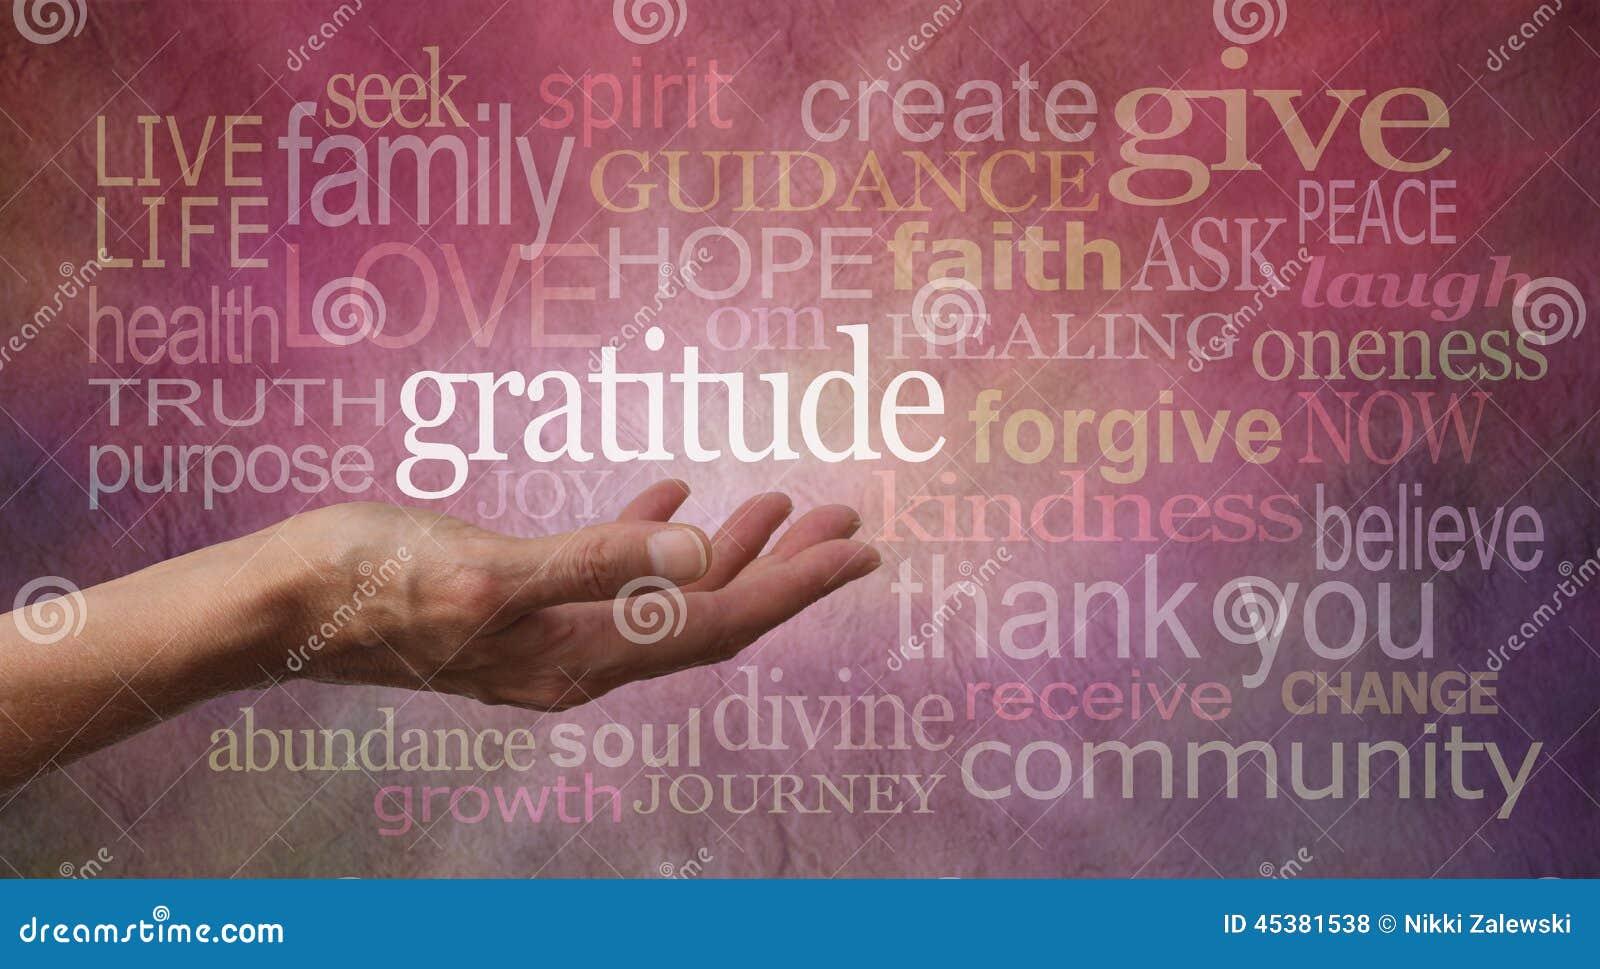 gratitude free image க்கான பட முடிவு